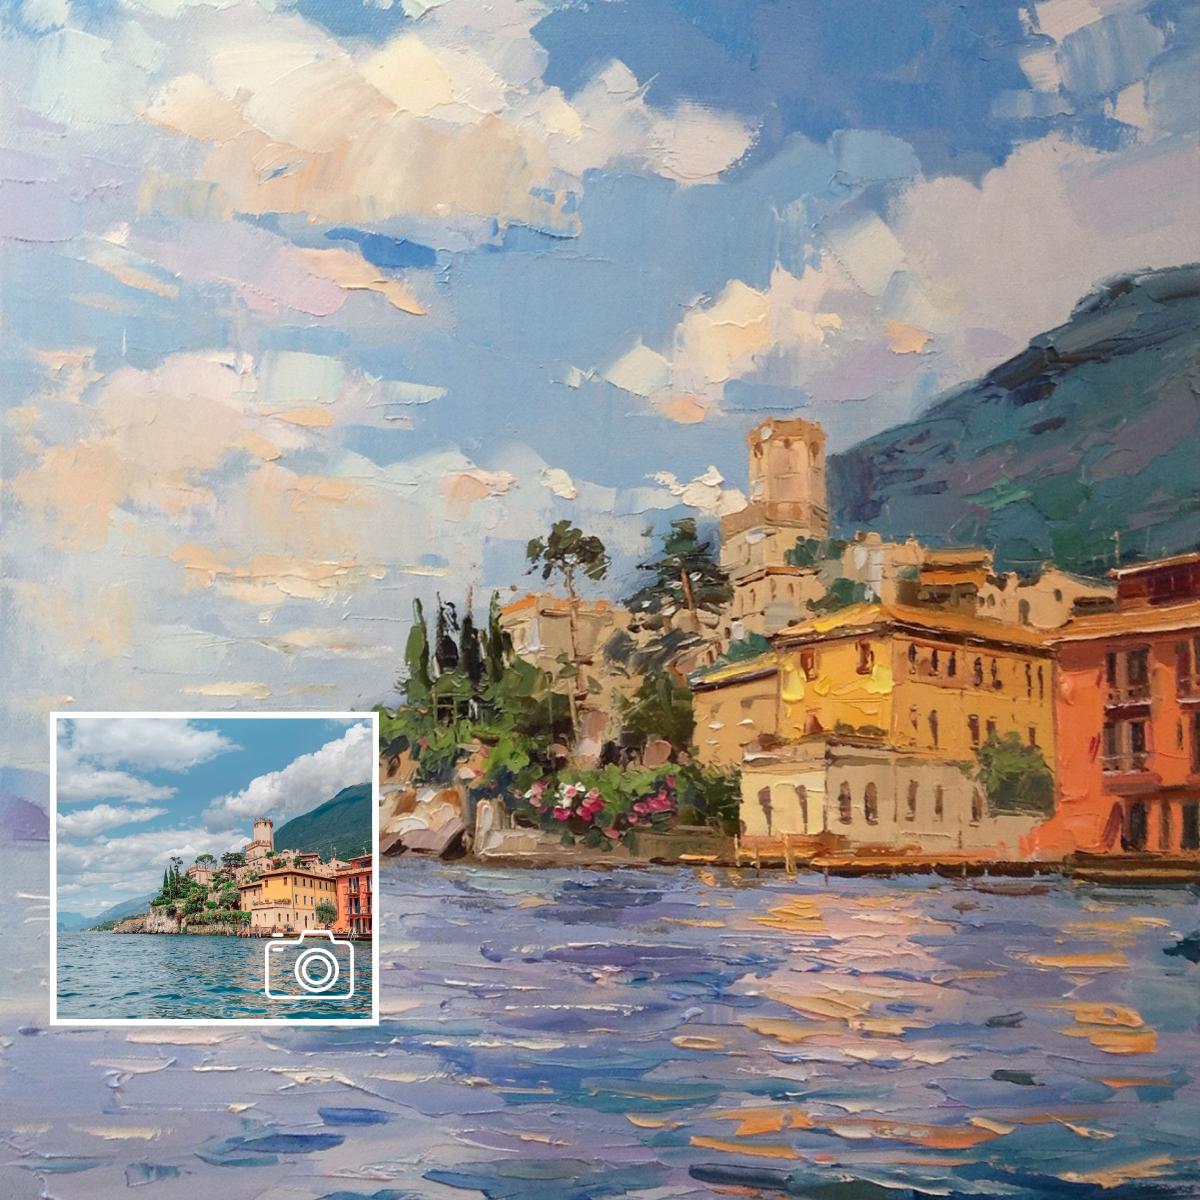 paintru-custom-artwork-commission-painterly-oil-lake-garda